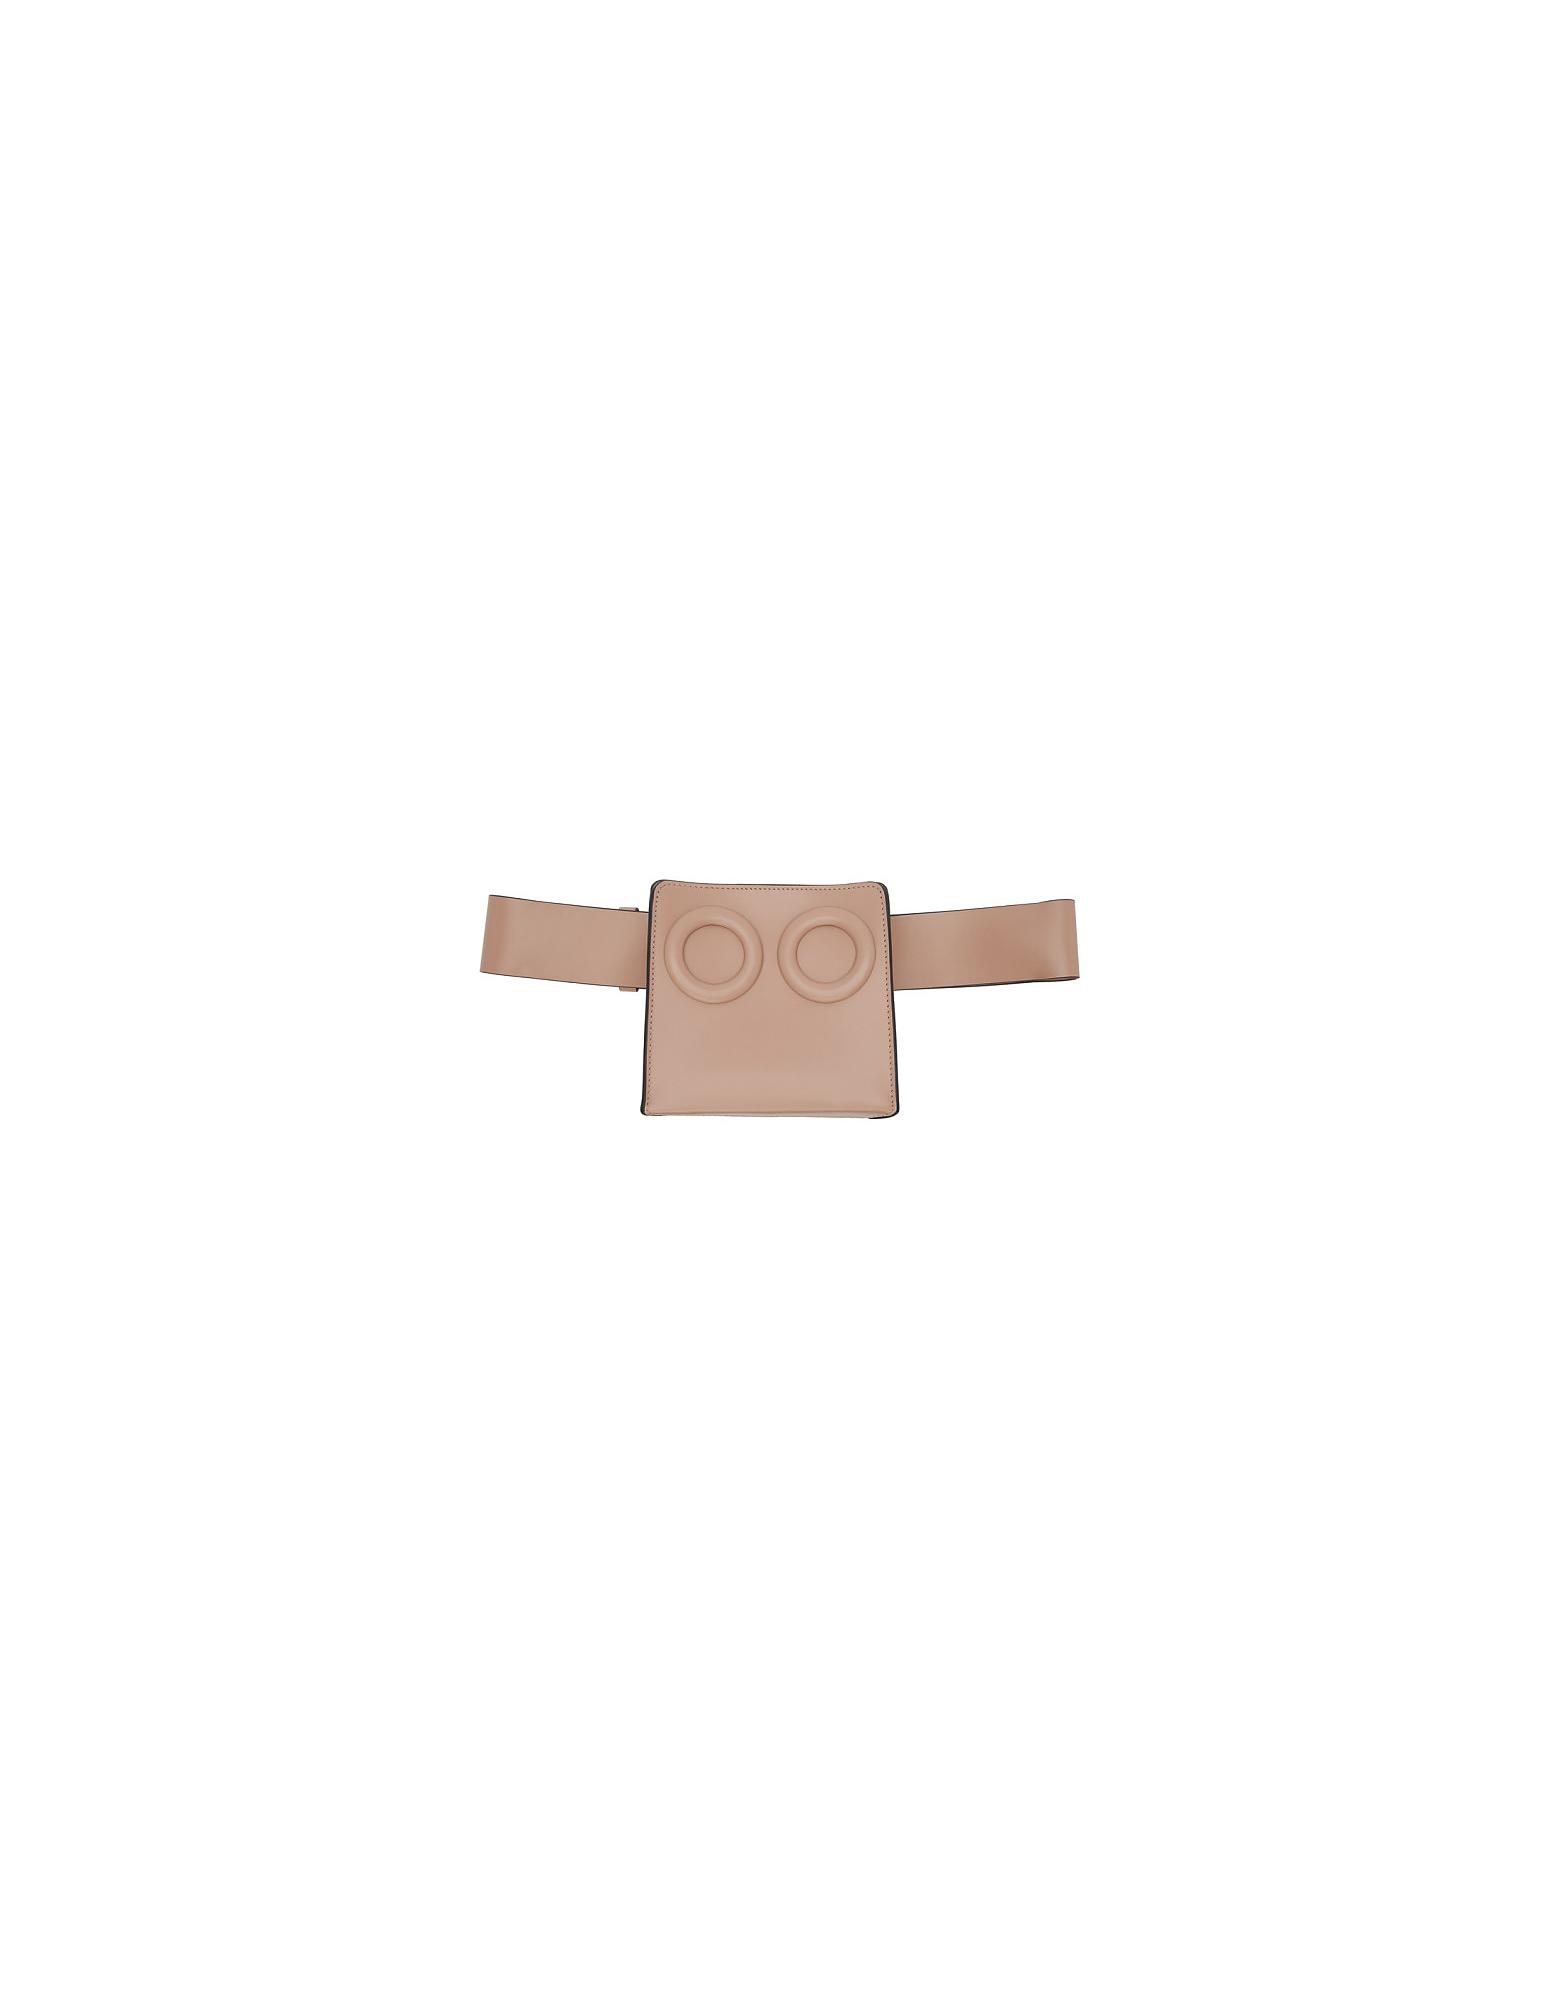 BOYY Designer Handbags, Pink Deon Belt Bag